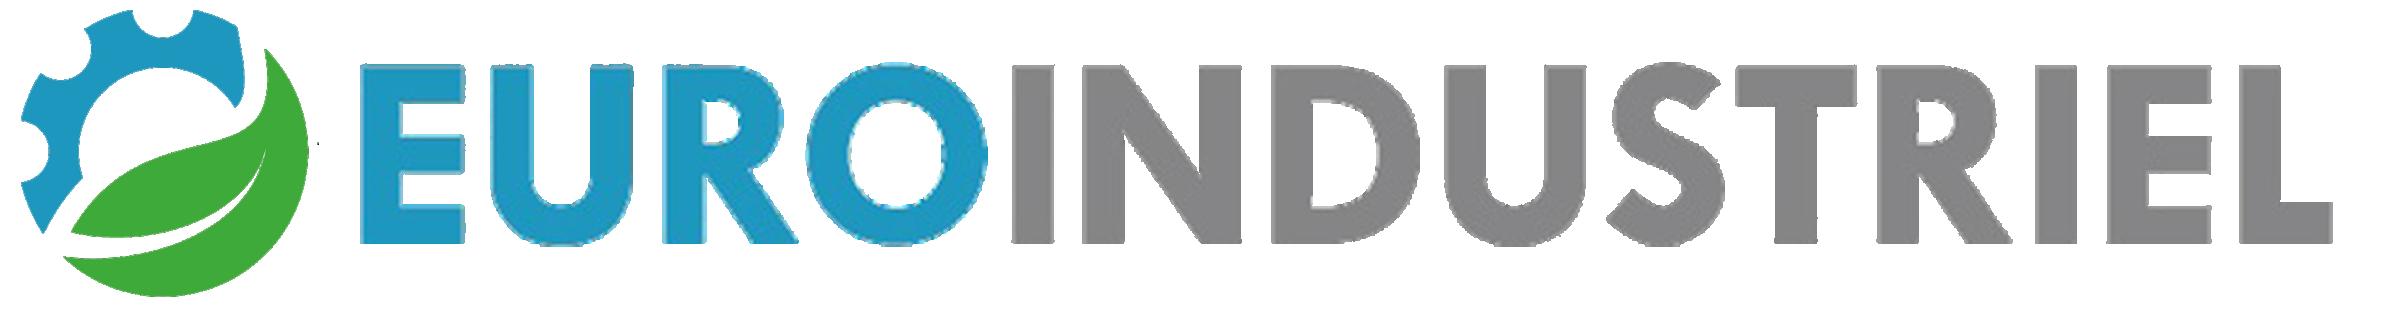 euroindustriel-logo